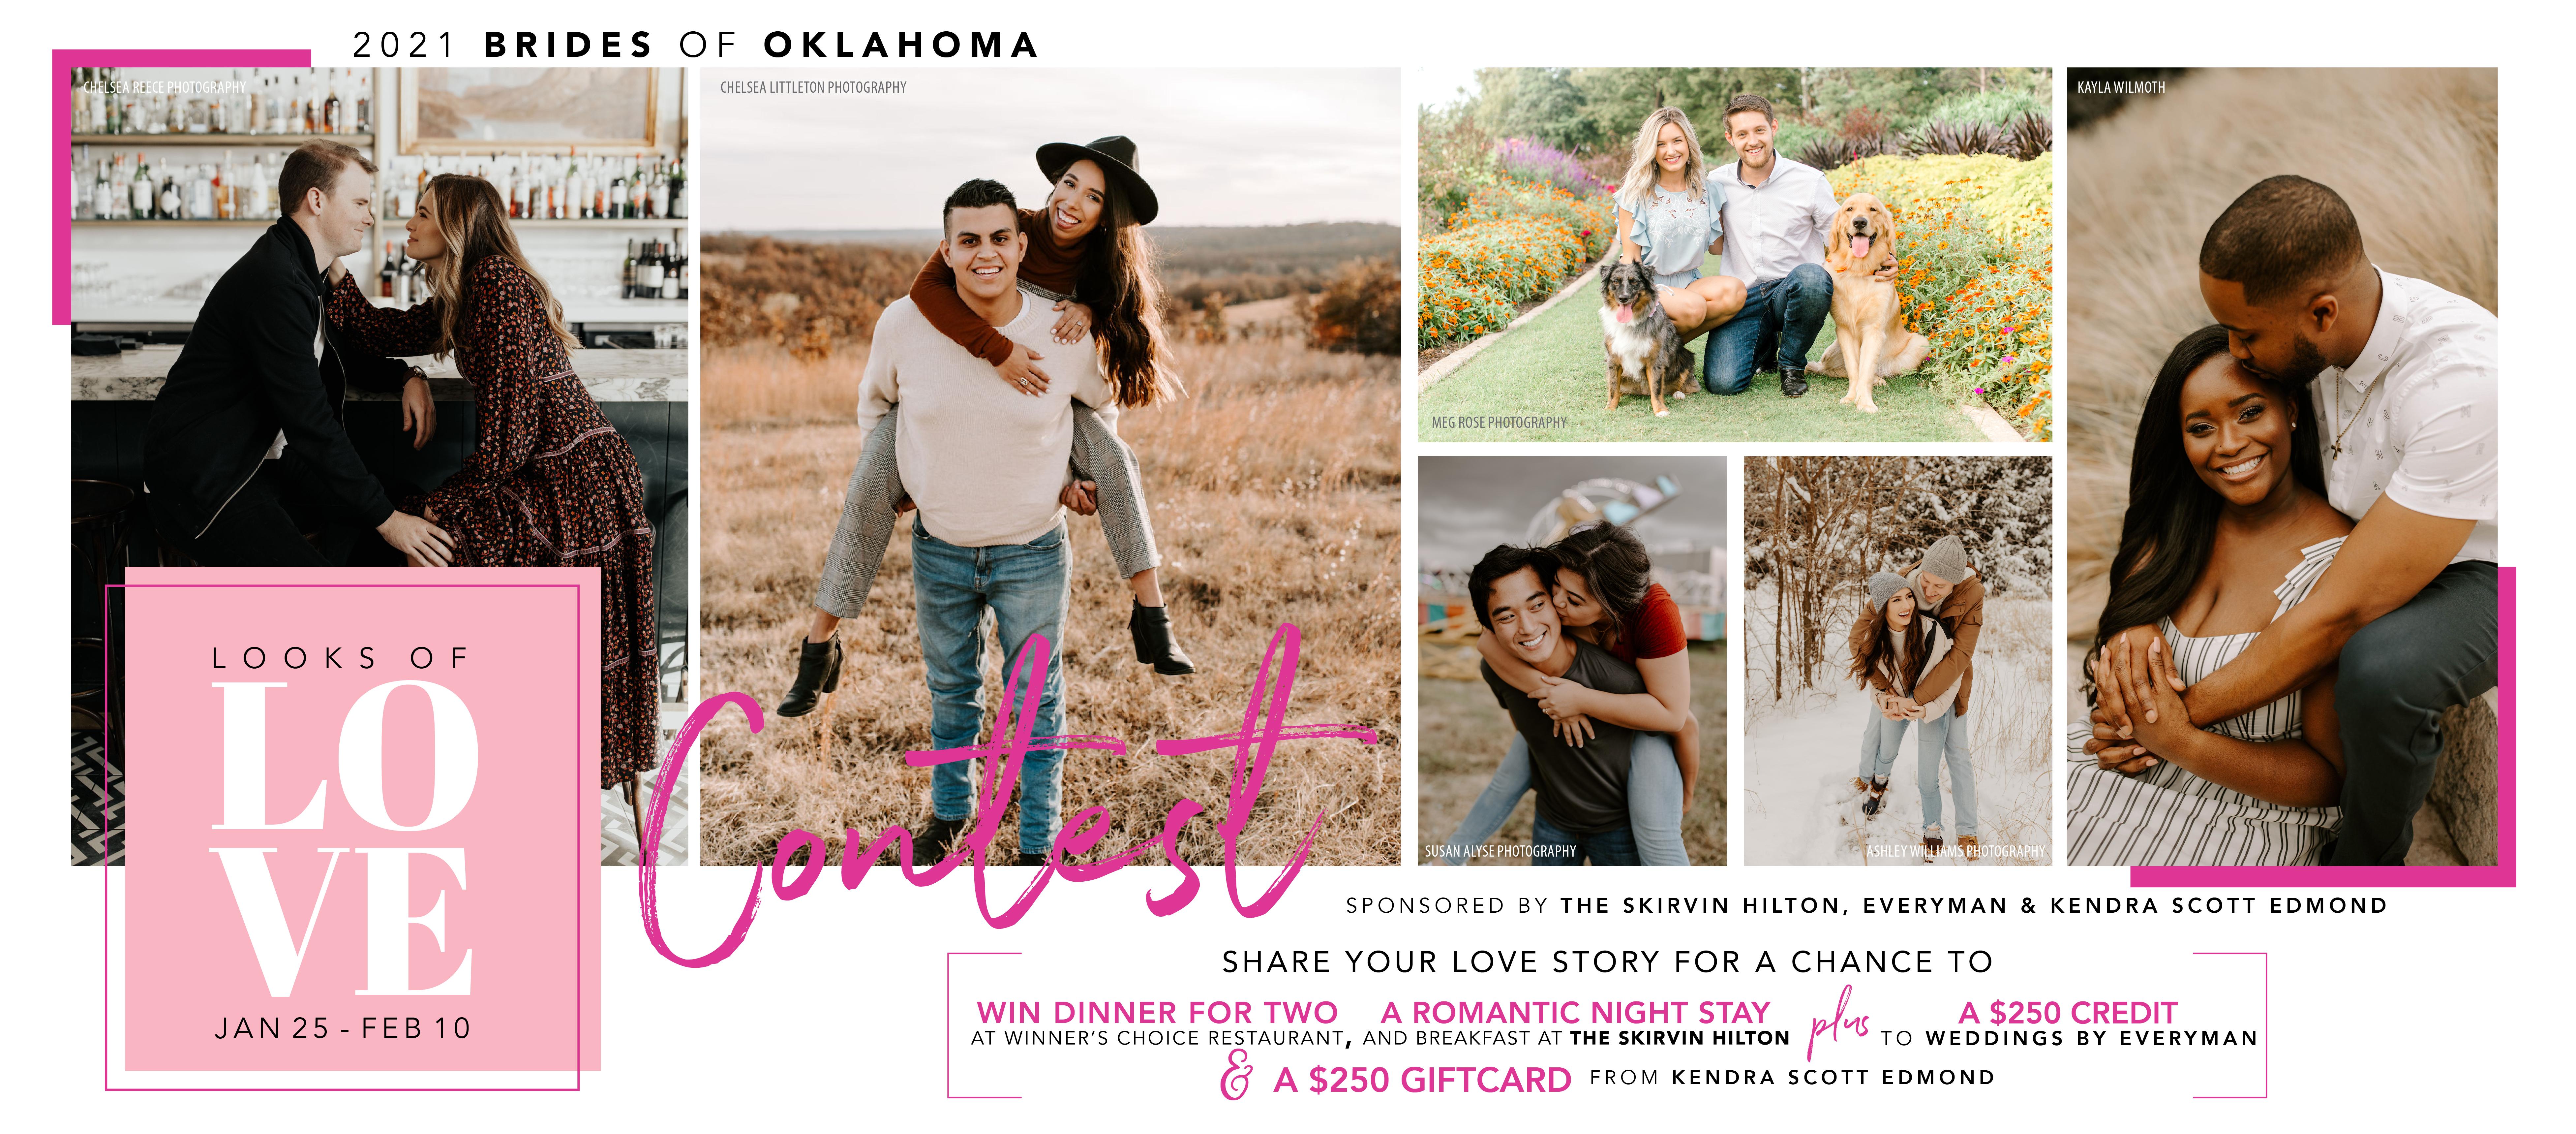 brides of Oklahoma looks of love contest 2021